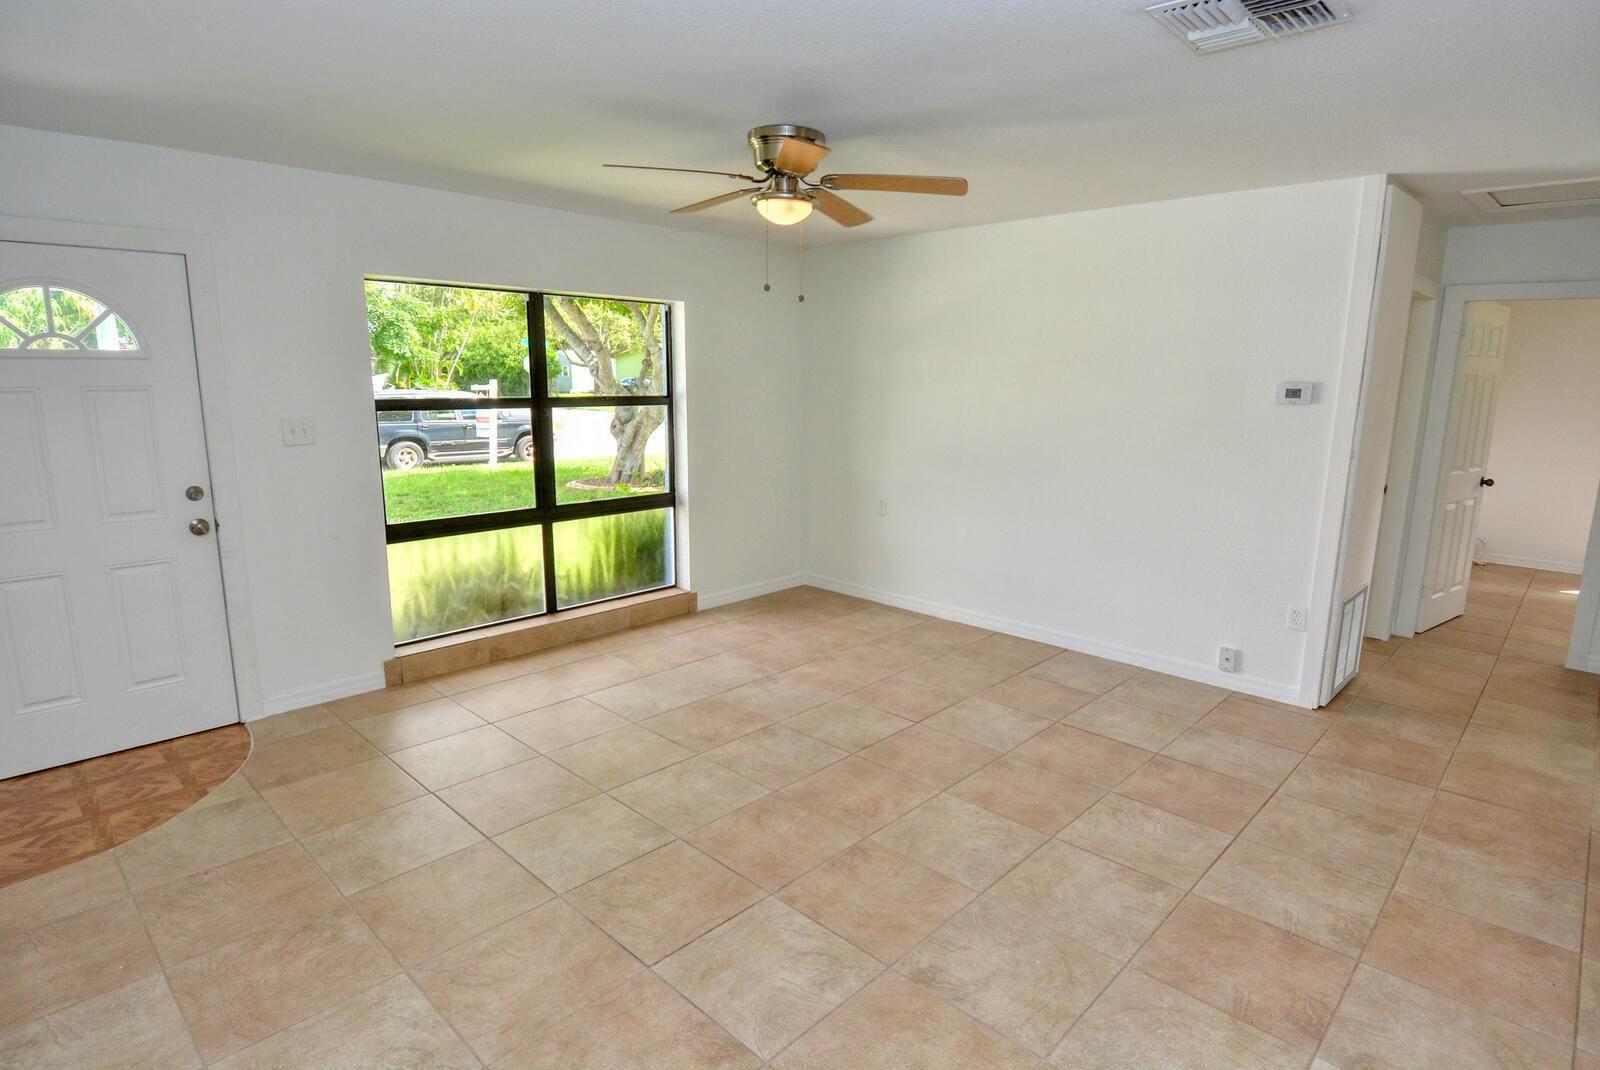 201 Maple Avenue, Fort Pierce, FL 34982